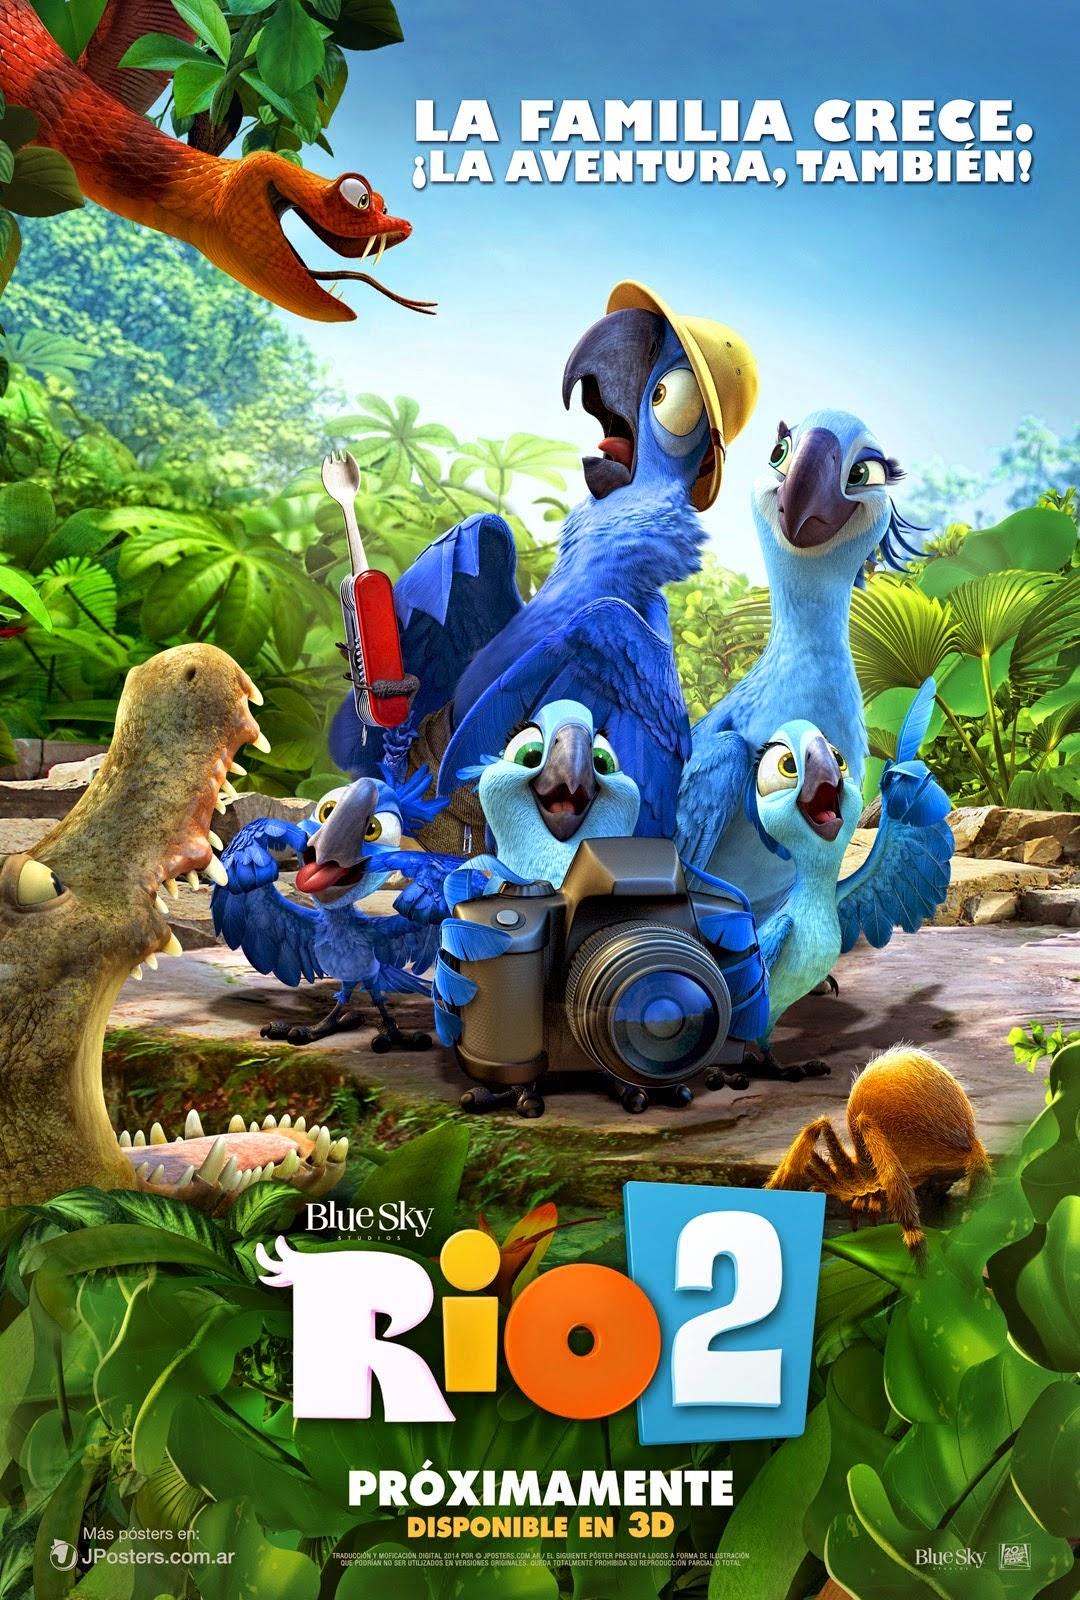 Rio 2 (2014) ริโอ 2 เจ้านกฟ้าจอมมึน 2 Full HD มาสเตอร์ พากย์ไทย